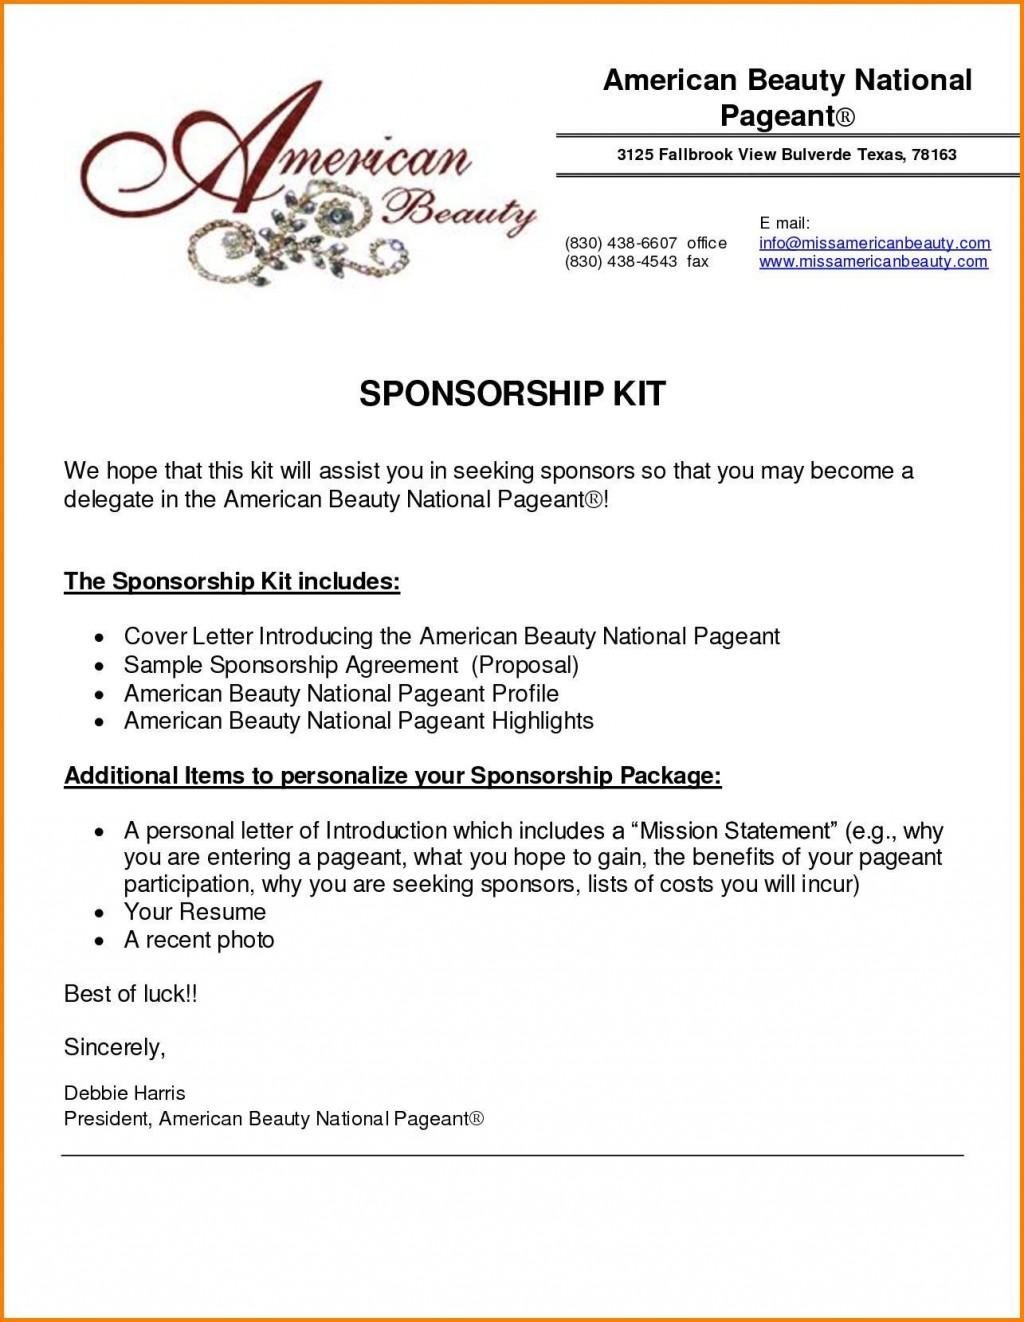 003 Imposing Event Sponsorship Proposal Sample Pdf Image  For Letter Music TemplateLarge